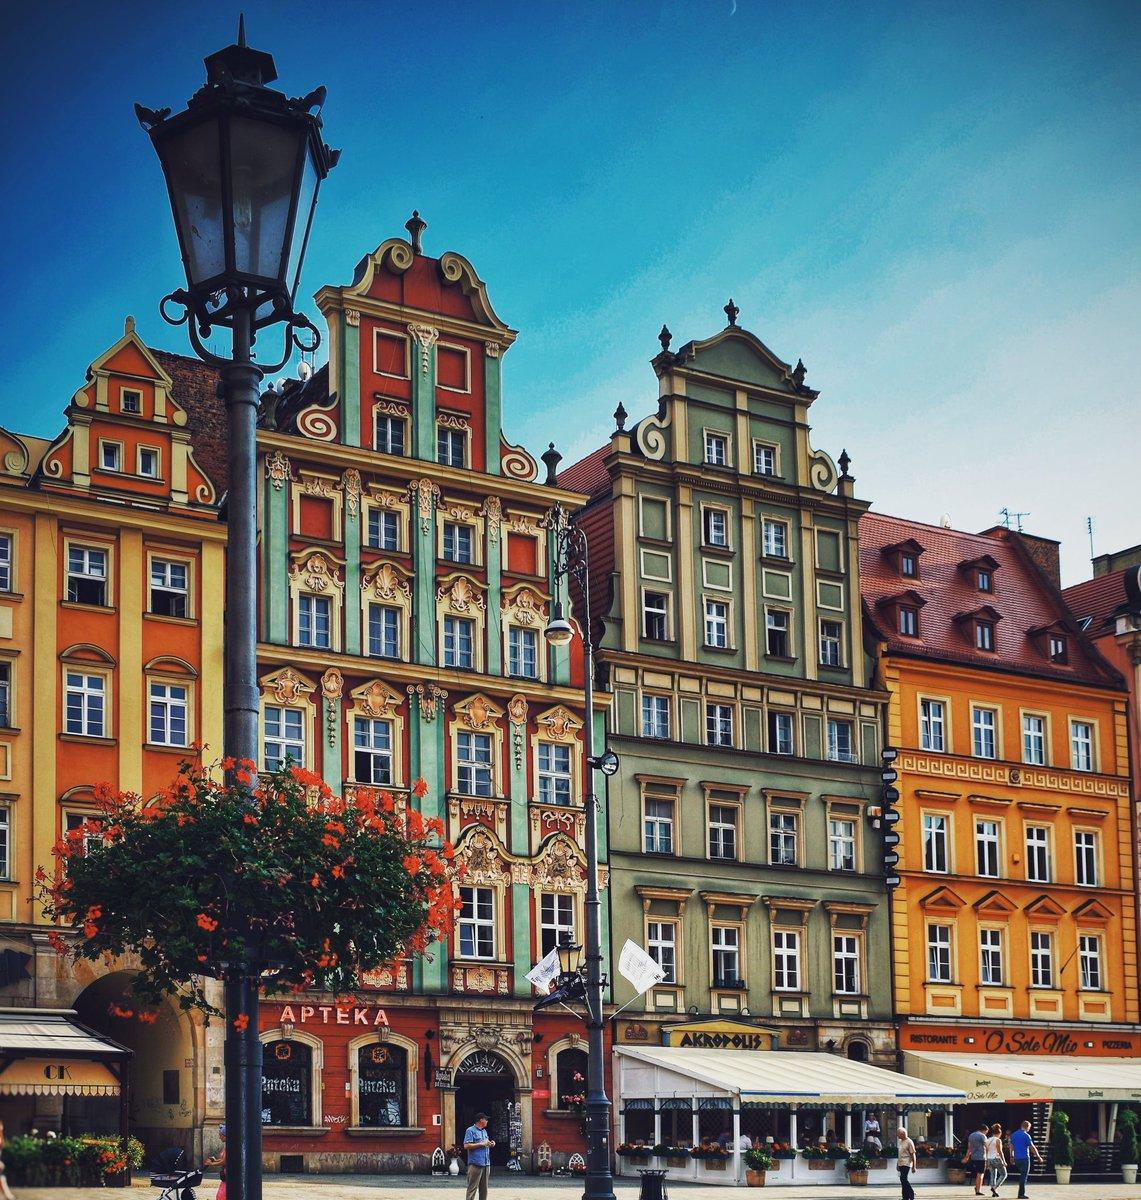 The colours are amazing! Wroclaw in Poland   #WeAreKuruWe #postcardsfromtheworld #TravelAddict #Travellingram #WorldTraveler #MyTravelStory #WanderingSoul #travel #wroclaw #travelblogger #polishboy #polska #poland #polskadziewczyna #polishgirl #warsaw #polandisbeautifulpic.twitter.com/yO2iq46MP8